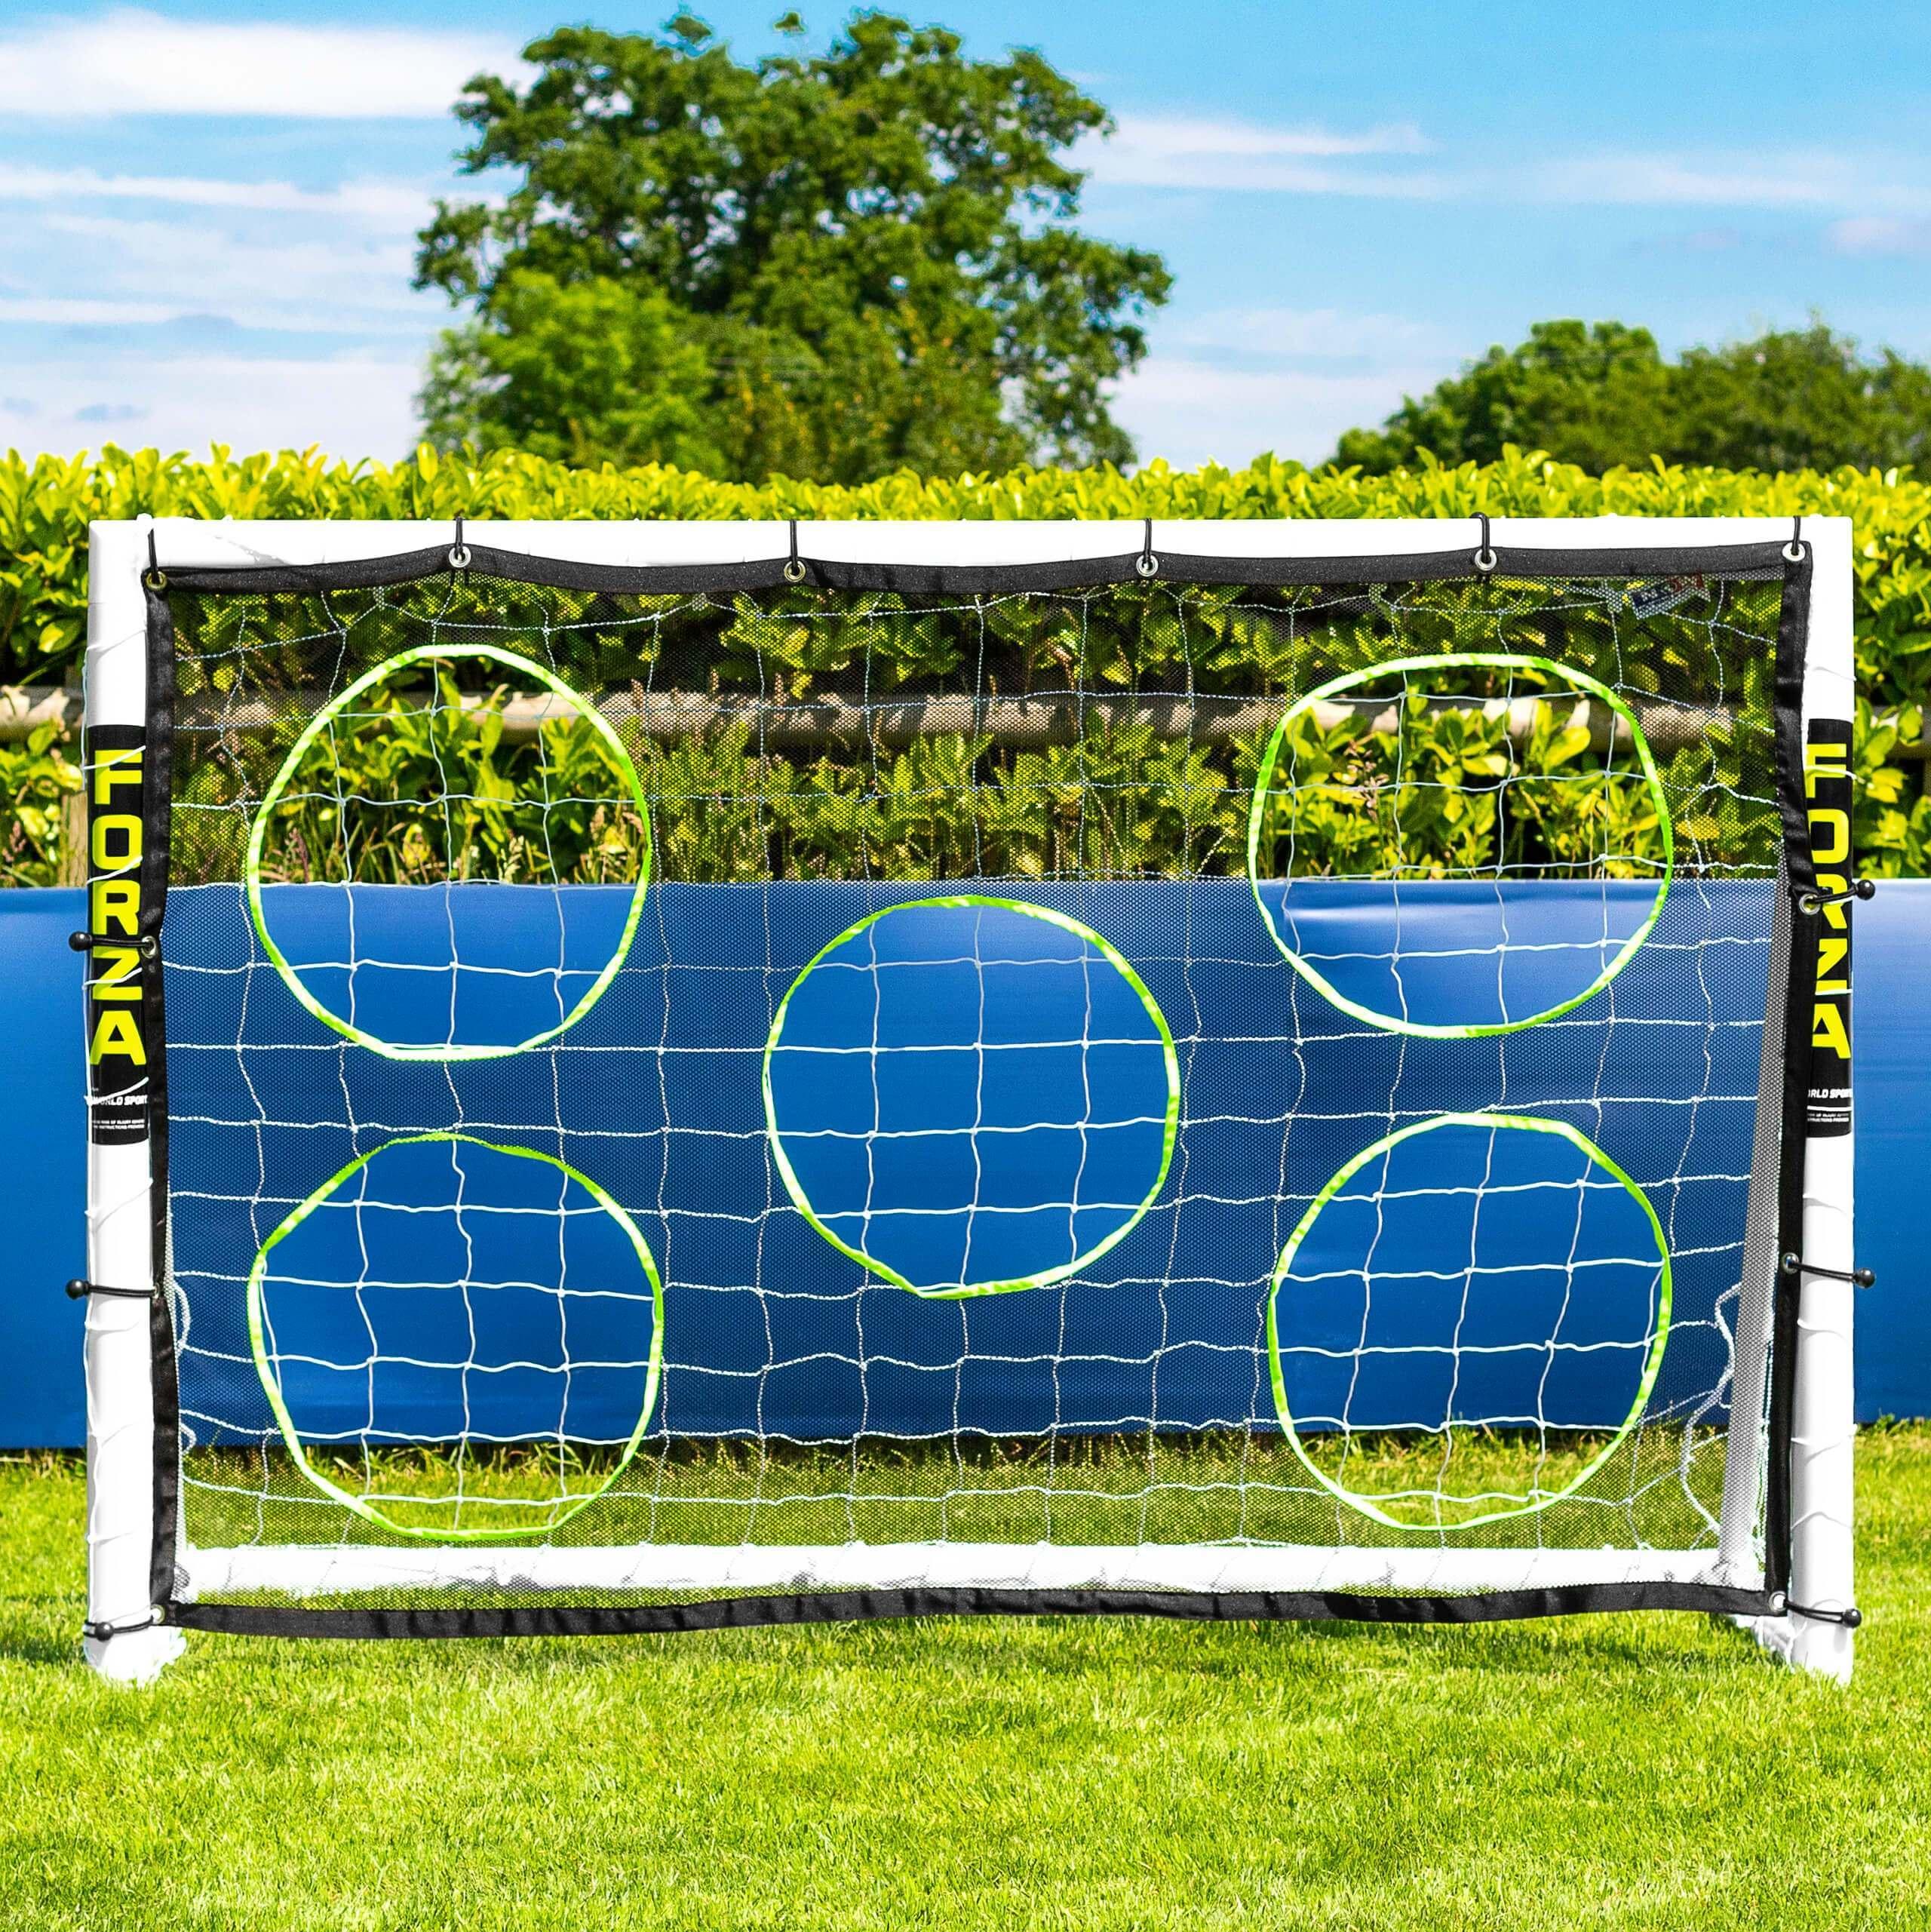 Soccer Goal Target Sheets 9 Size Options